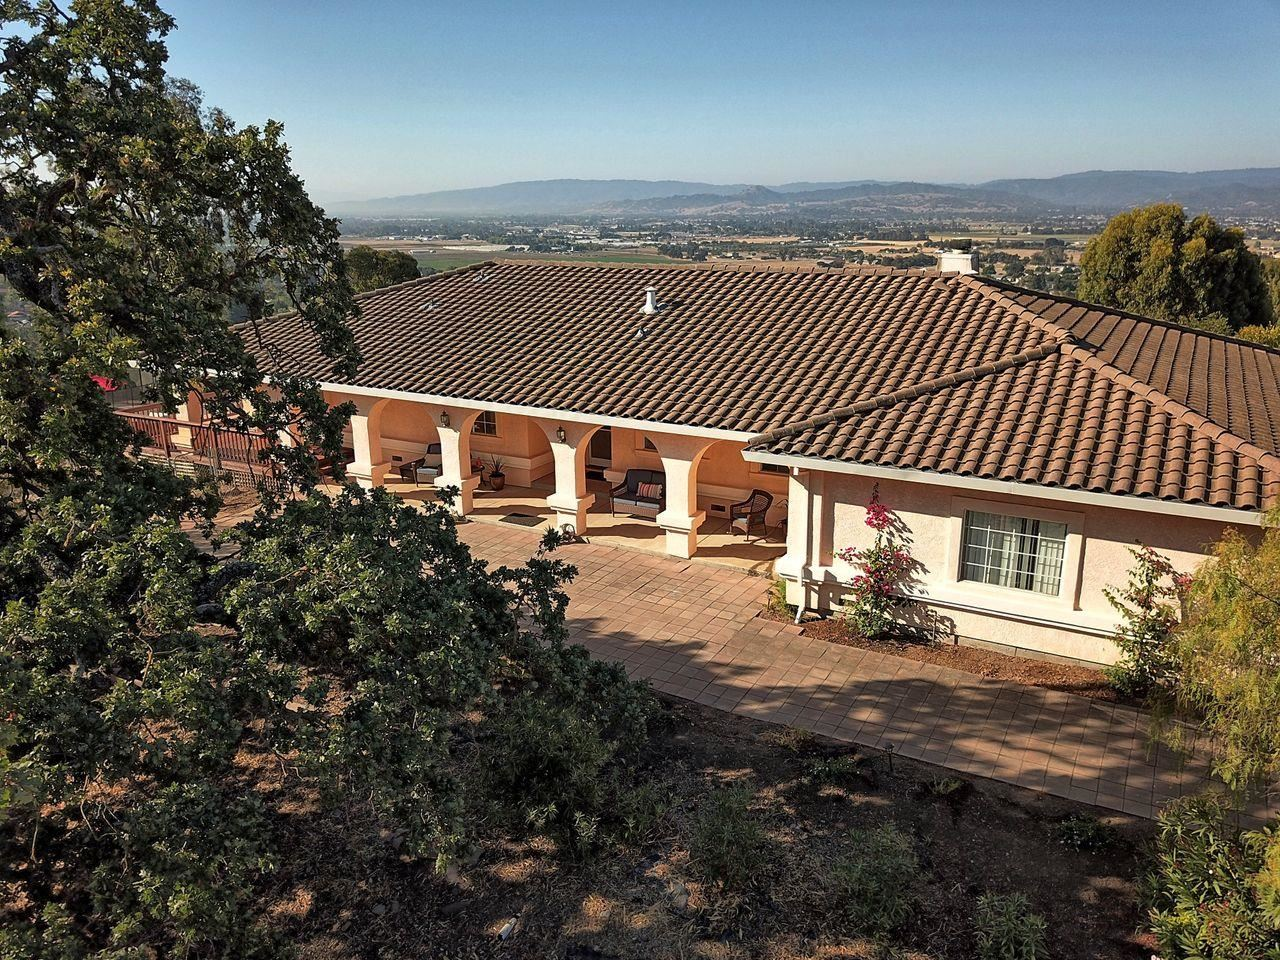 Photo for 17101 Kruse Ranch Lane, MORGAN HILL, CA 95037 (MLS # ML81860296)